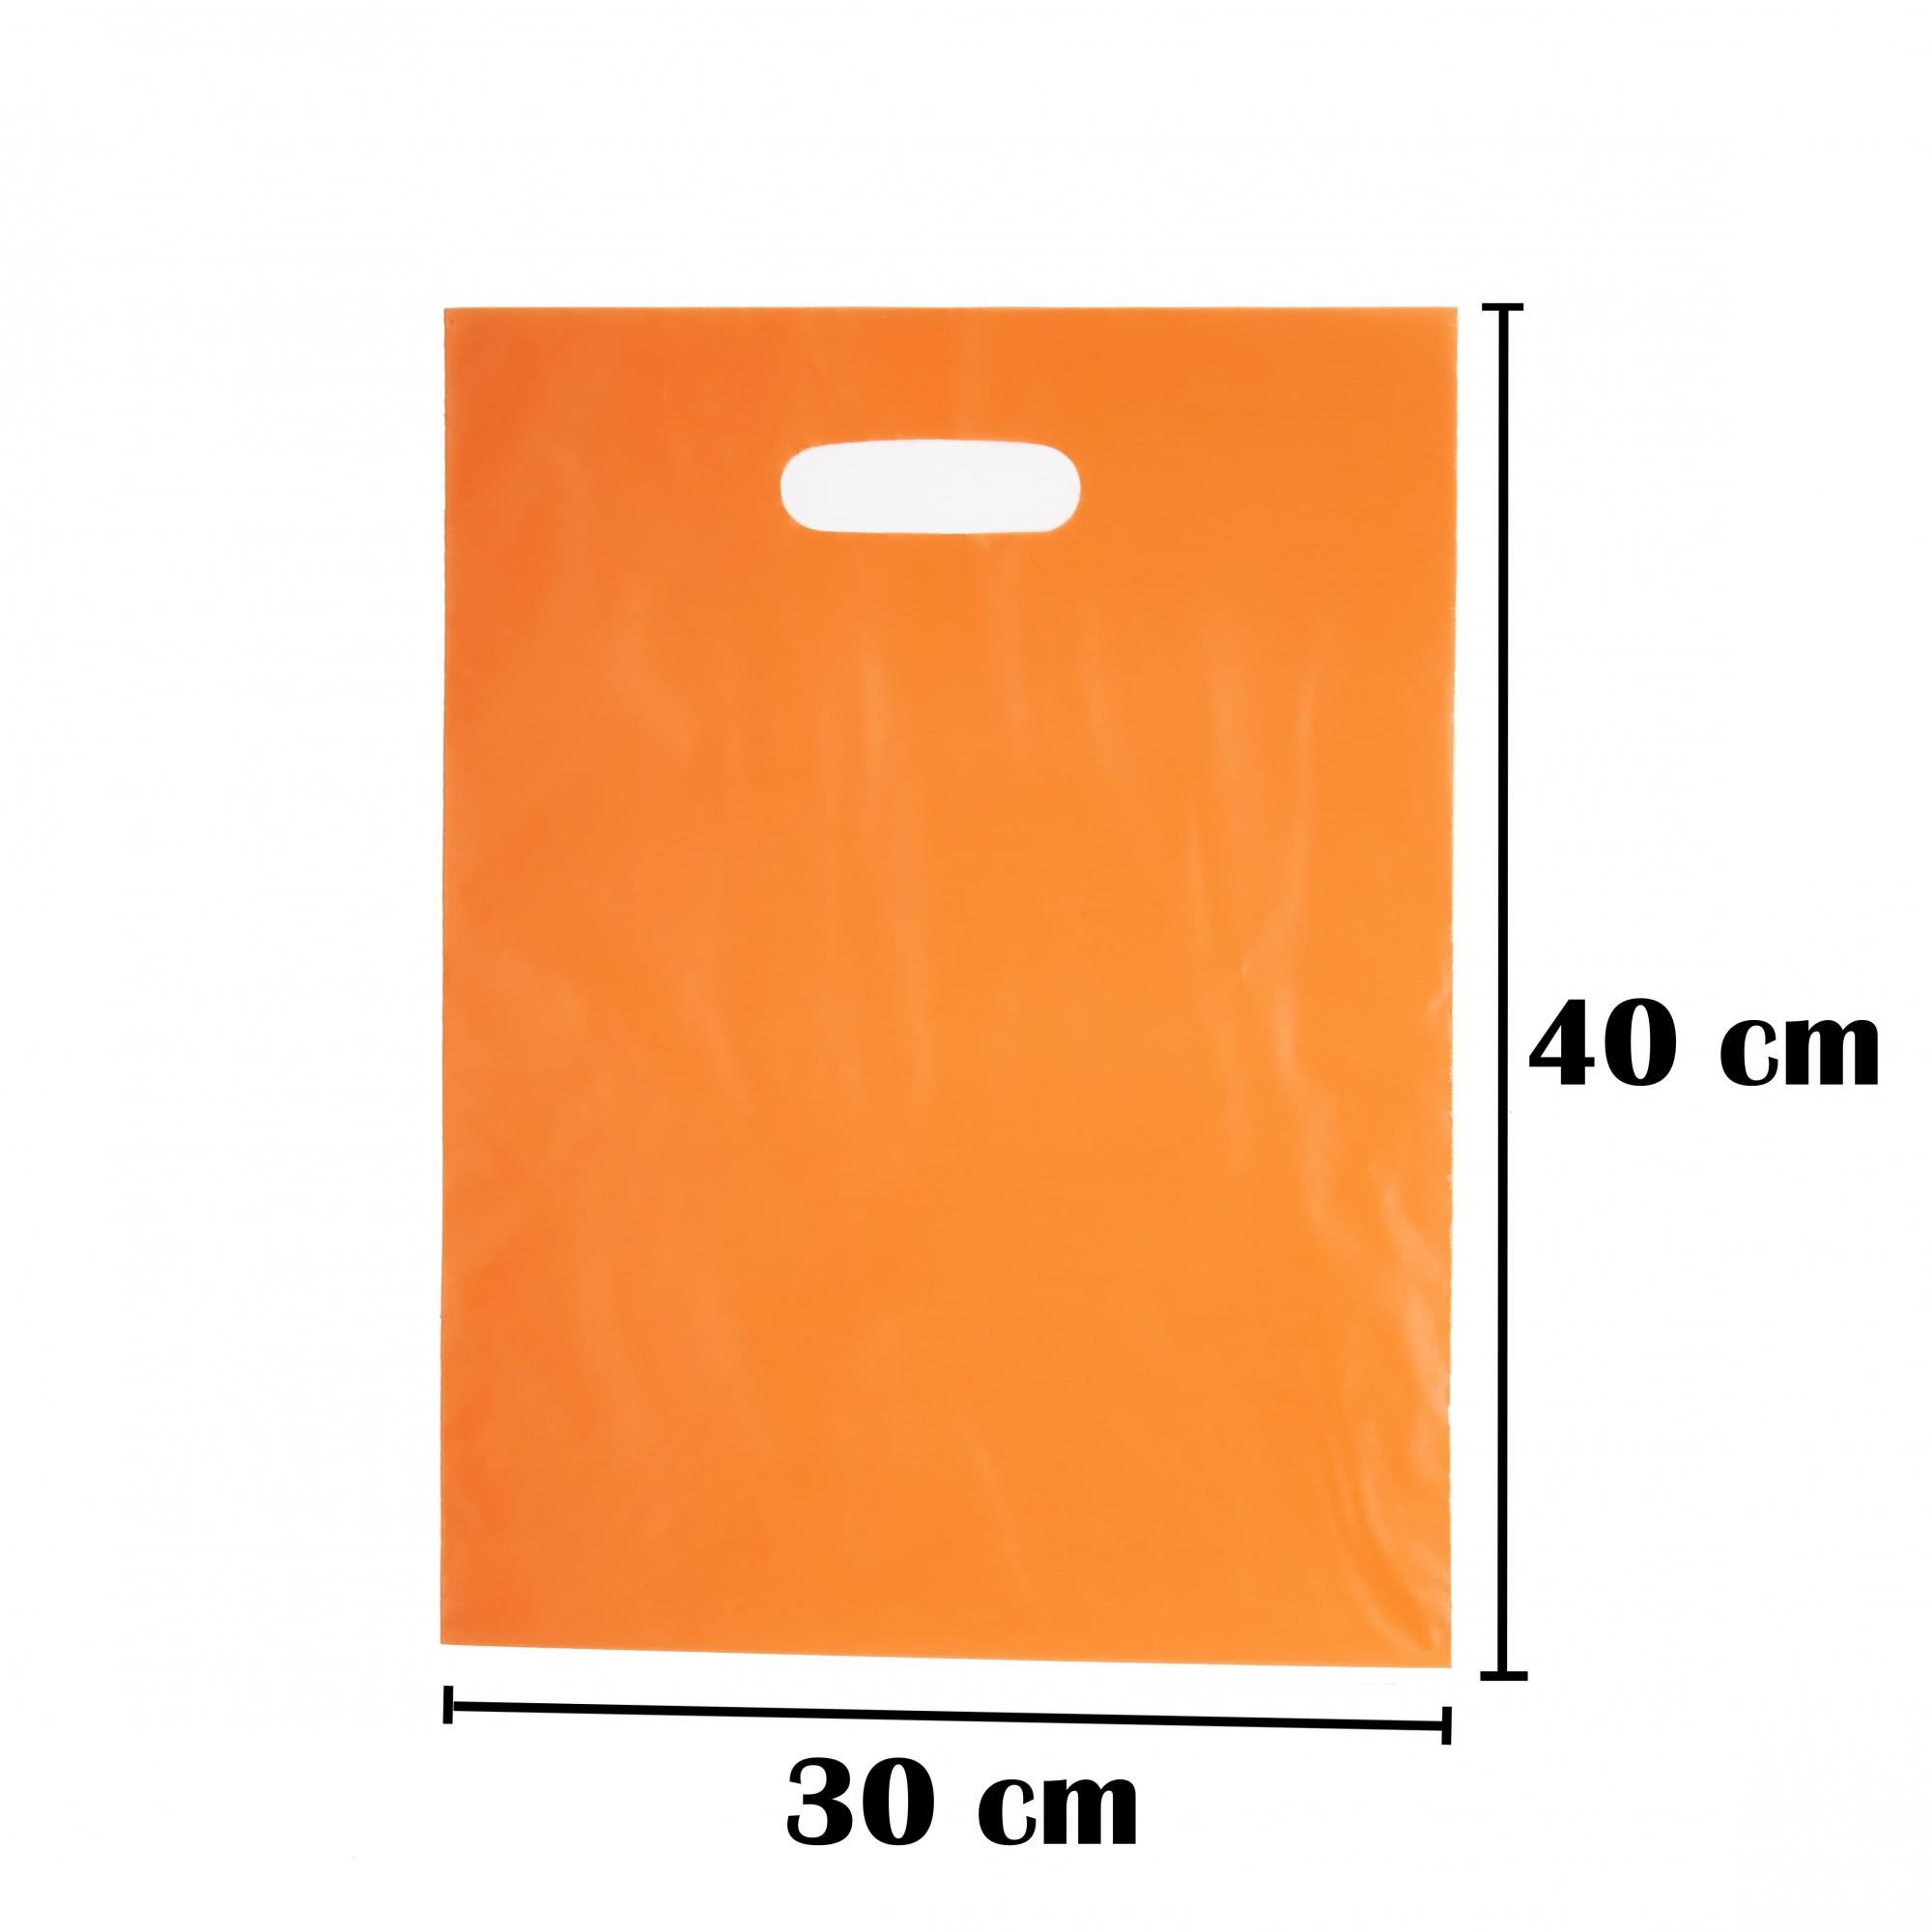 Sacola Plástica 30x40 Laranja Alça Boca de Palhaço 500 Unidades